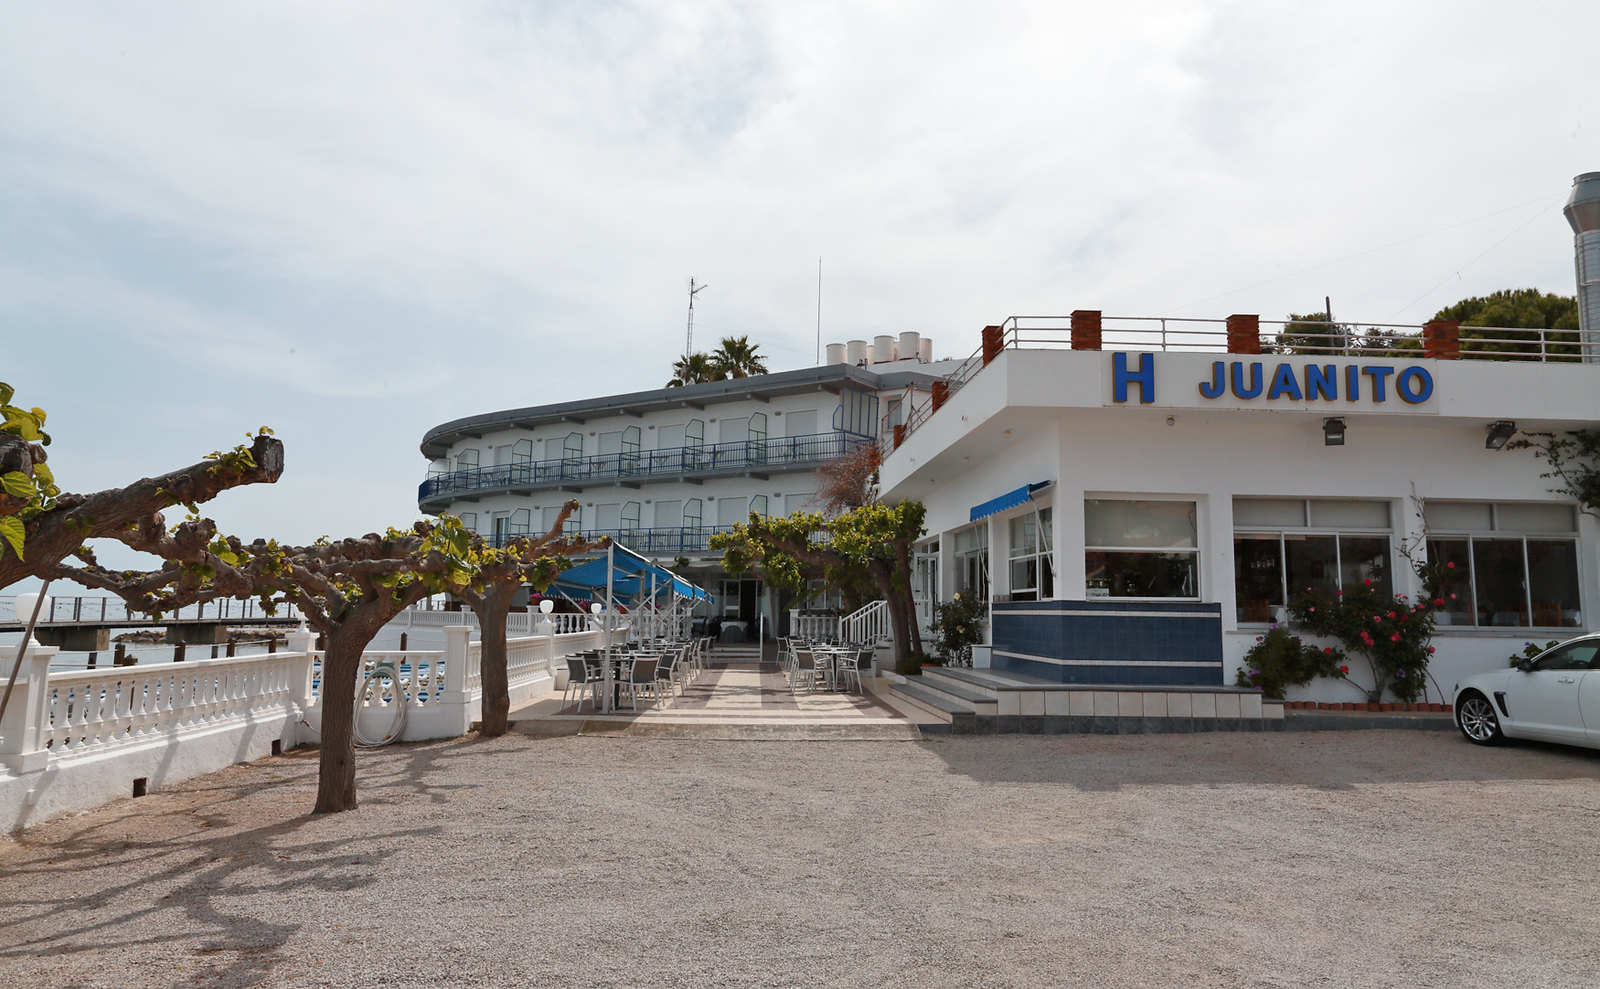 Hotel Juanito -  - Sant Carles de la Rapita